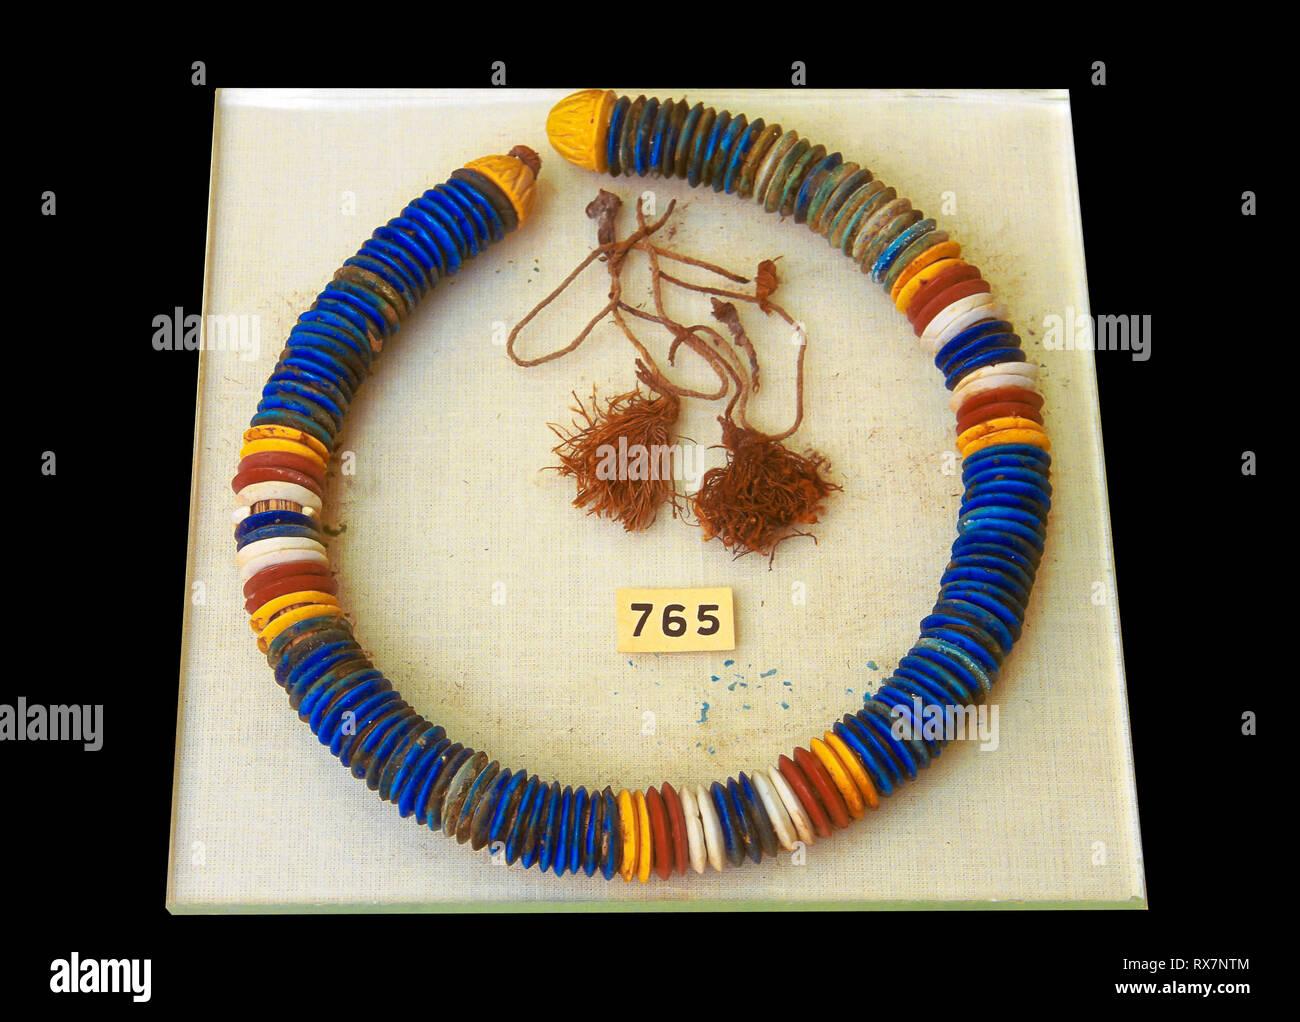 Necklace. Tutankhamun's treasure. Museum of Egyptian Antiquities. Cairo. Egypt. Africa - Stock Image